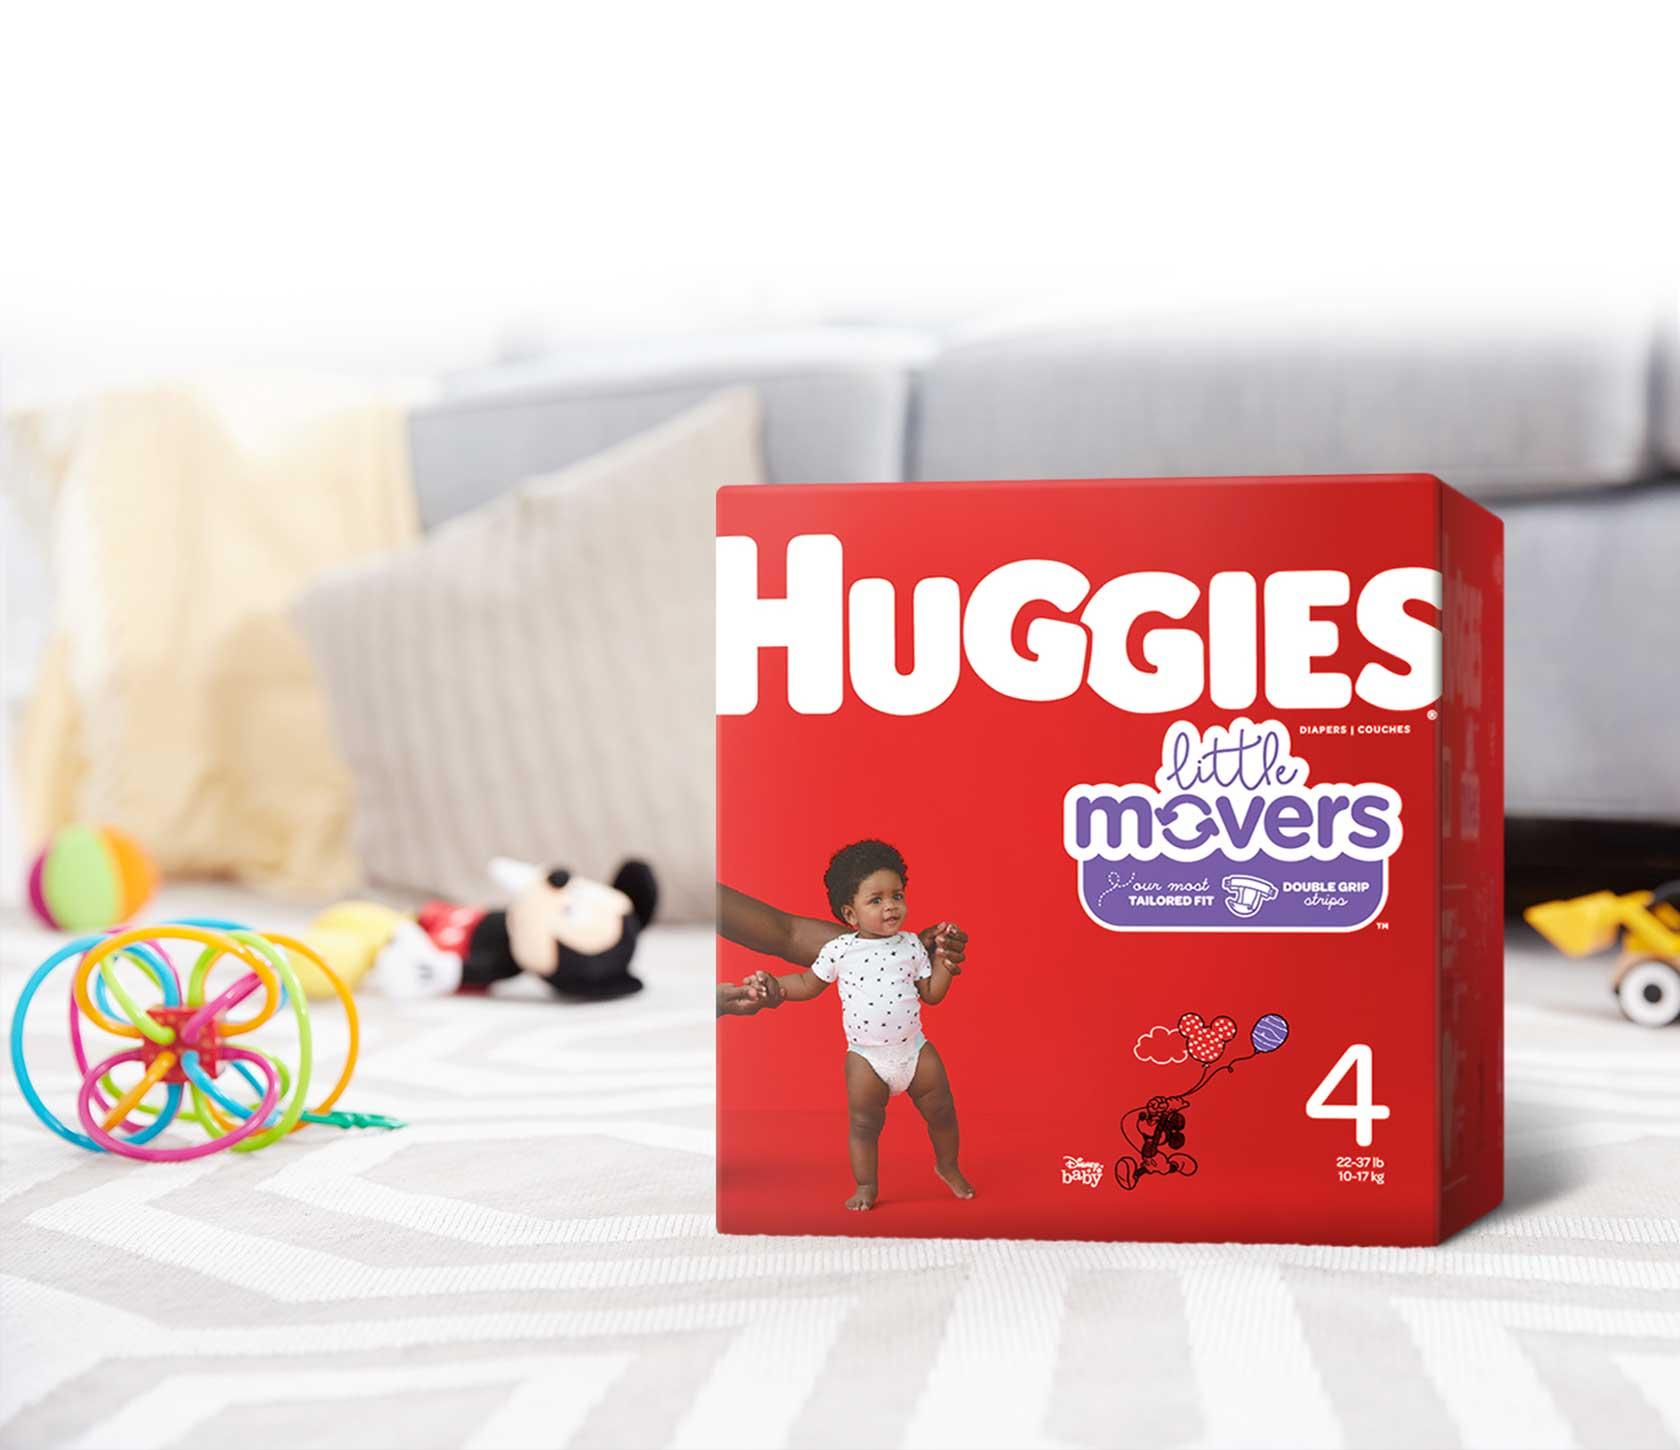 Huggies little movers diapers. Diaper clipart diaper box